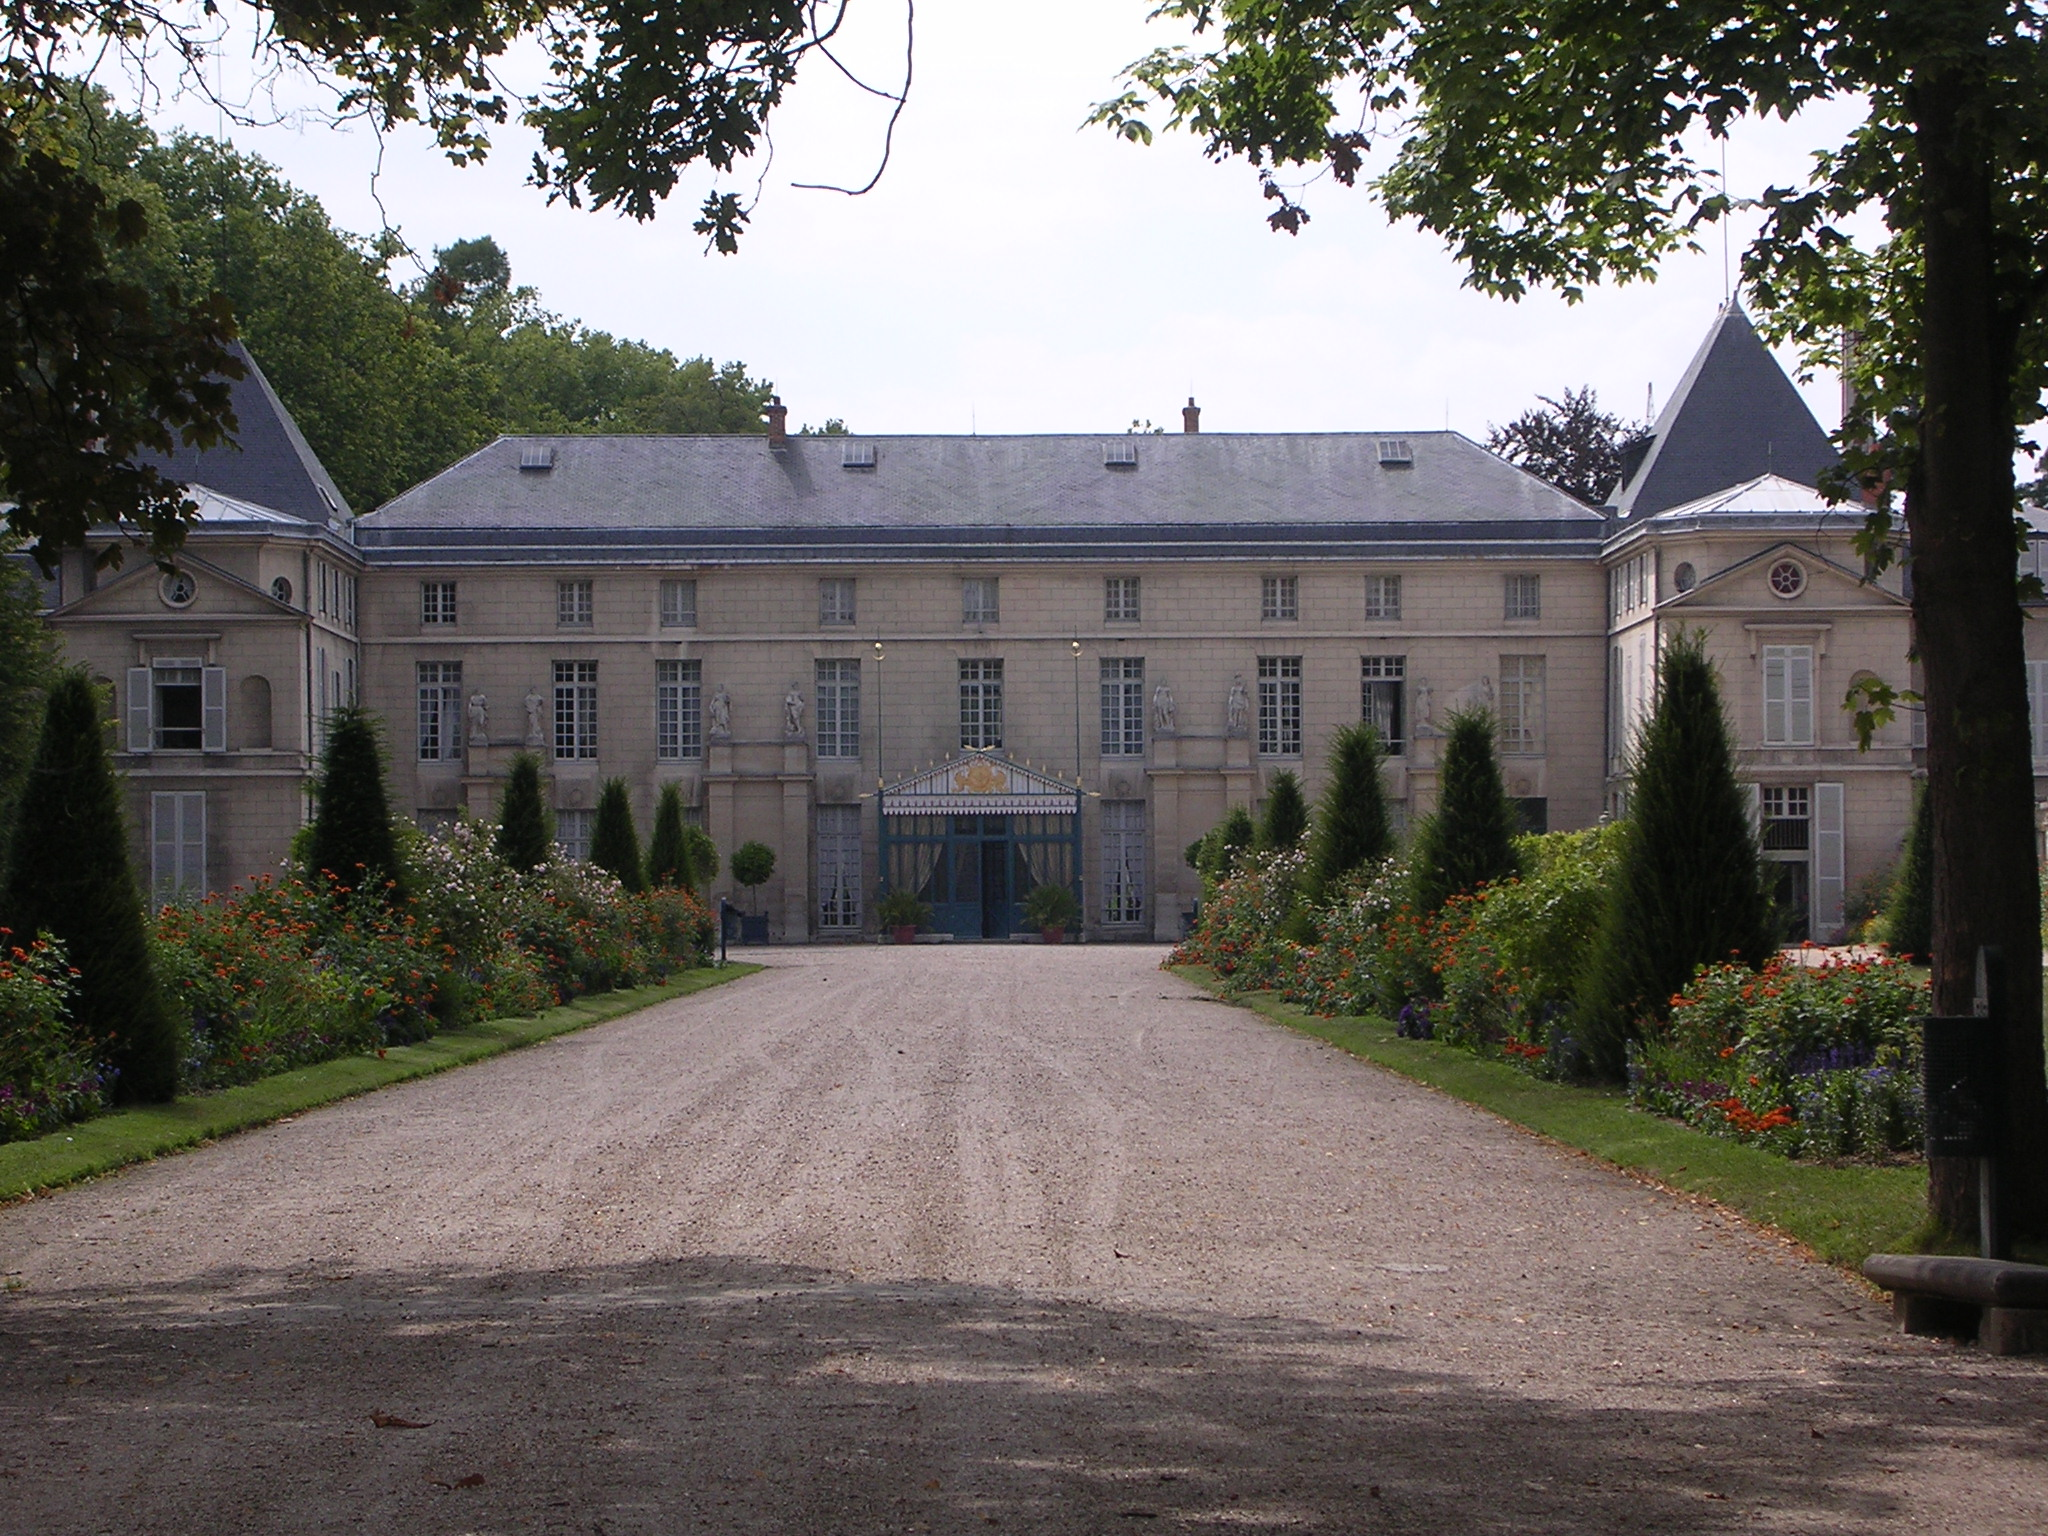 Depiction of Castillo de Malmaison